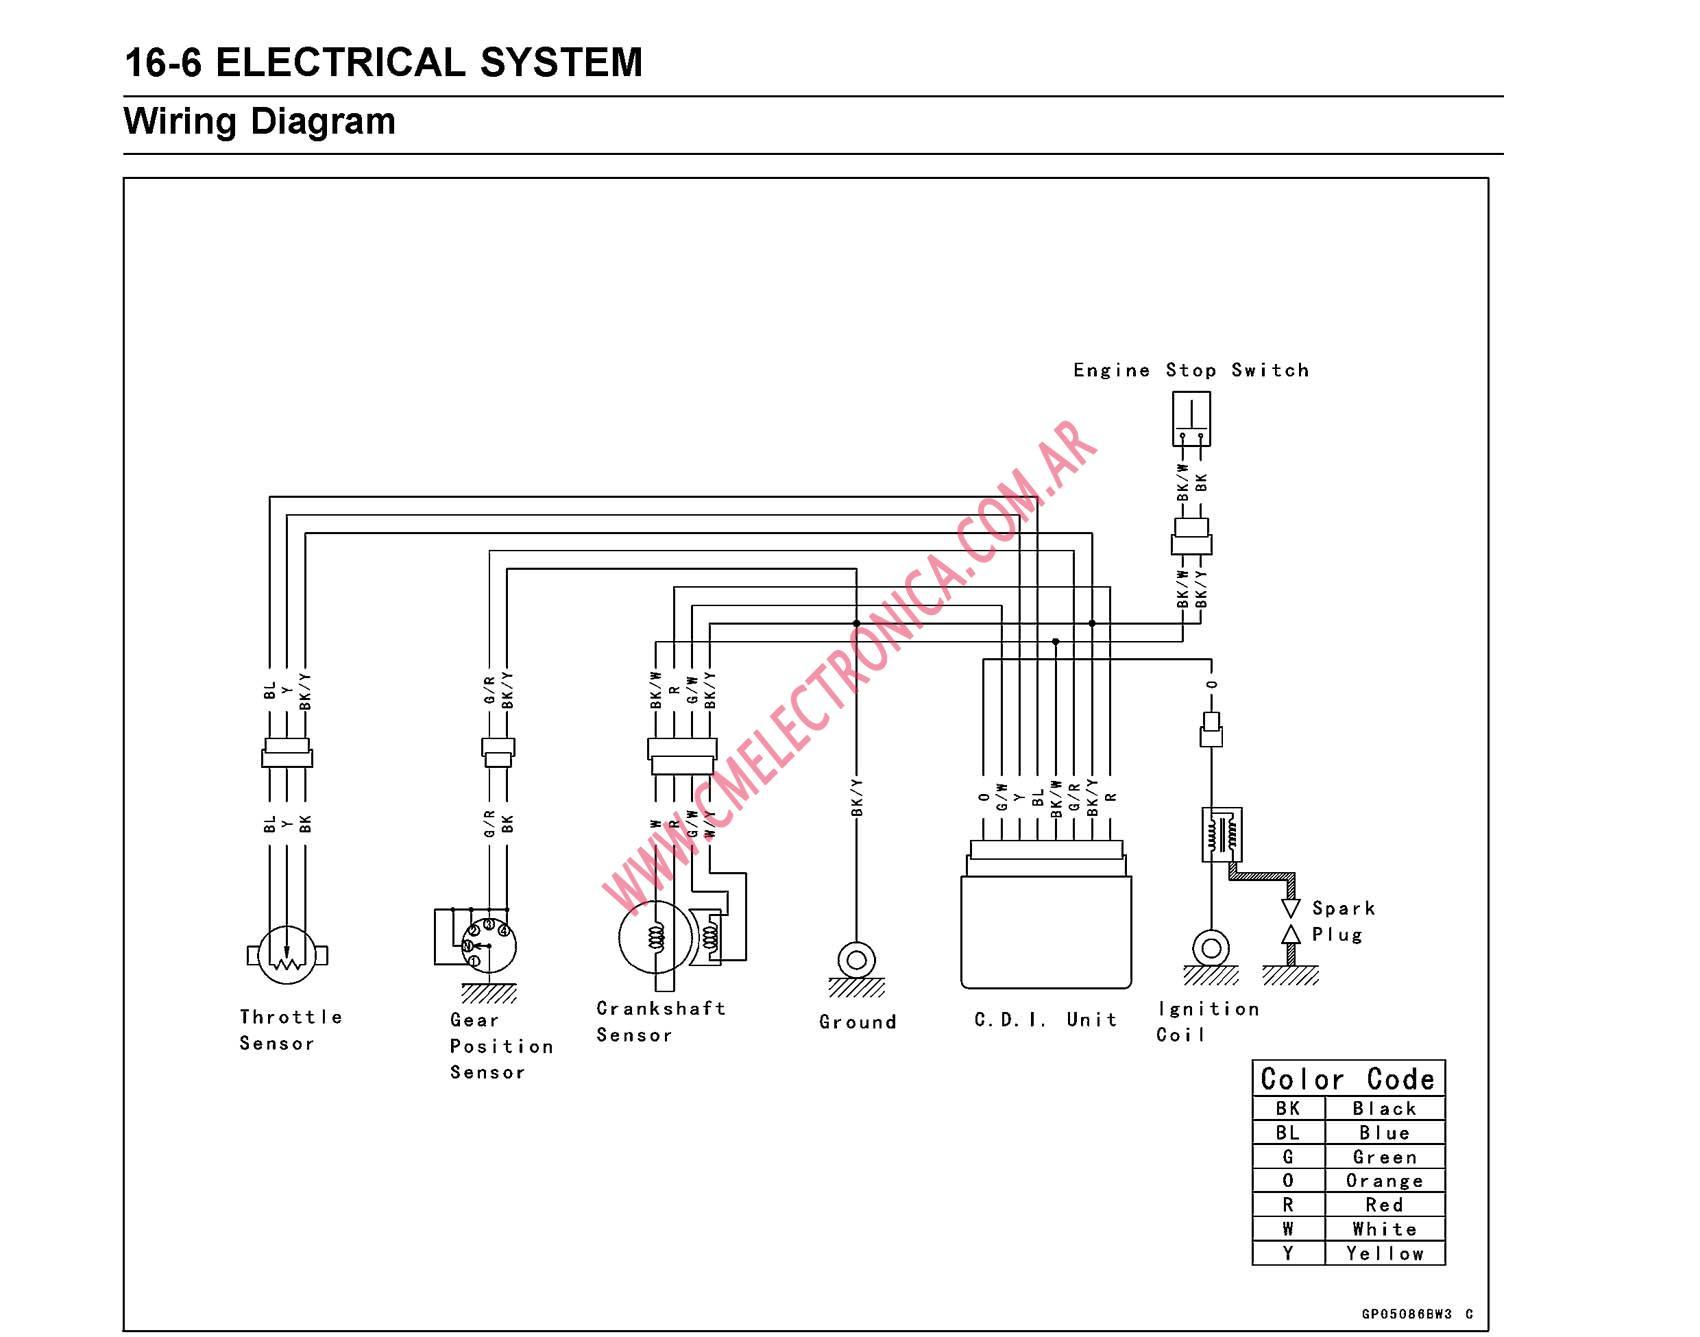 kawasaki kx80 wiring diagram cdi kawasaki hd3 125 wiring  kx 125 wiring diagram #5